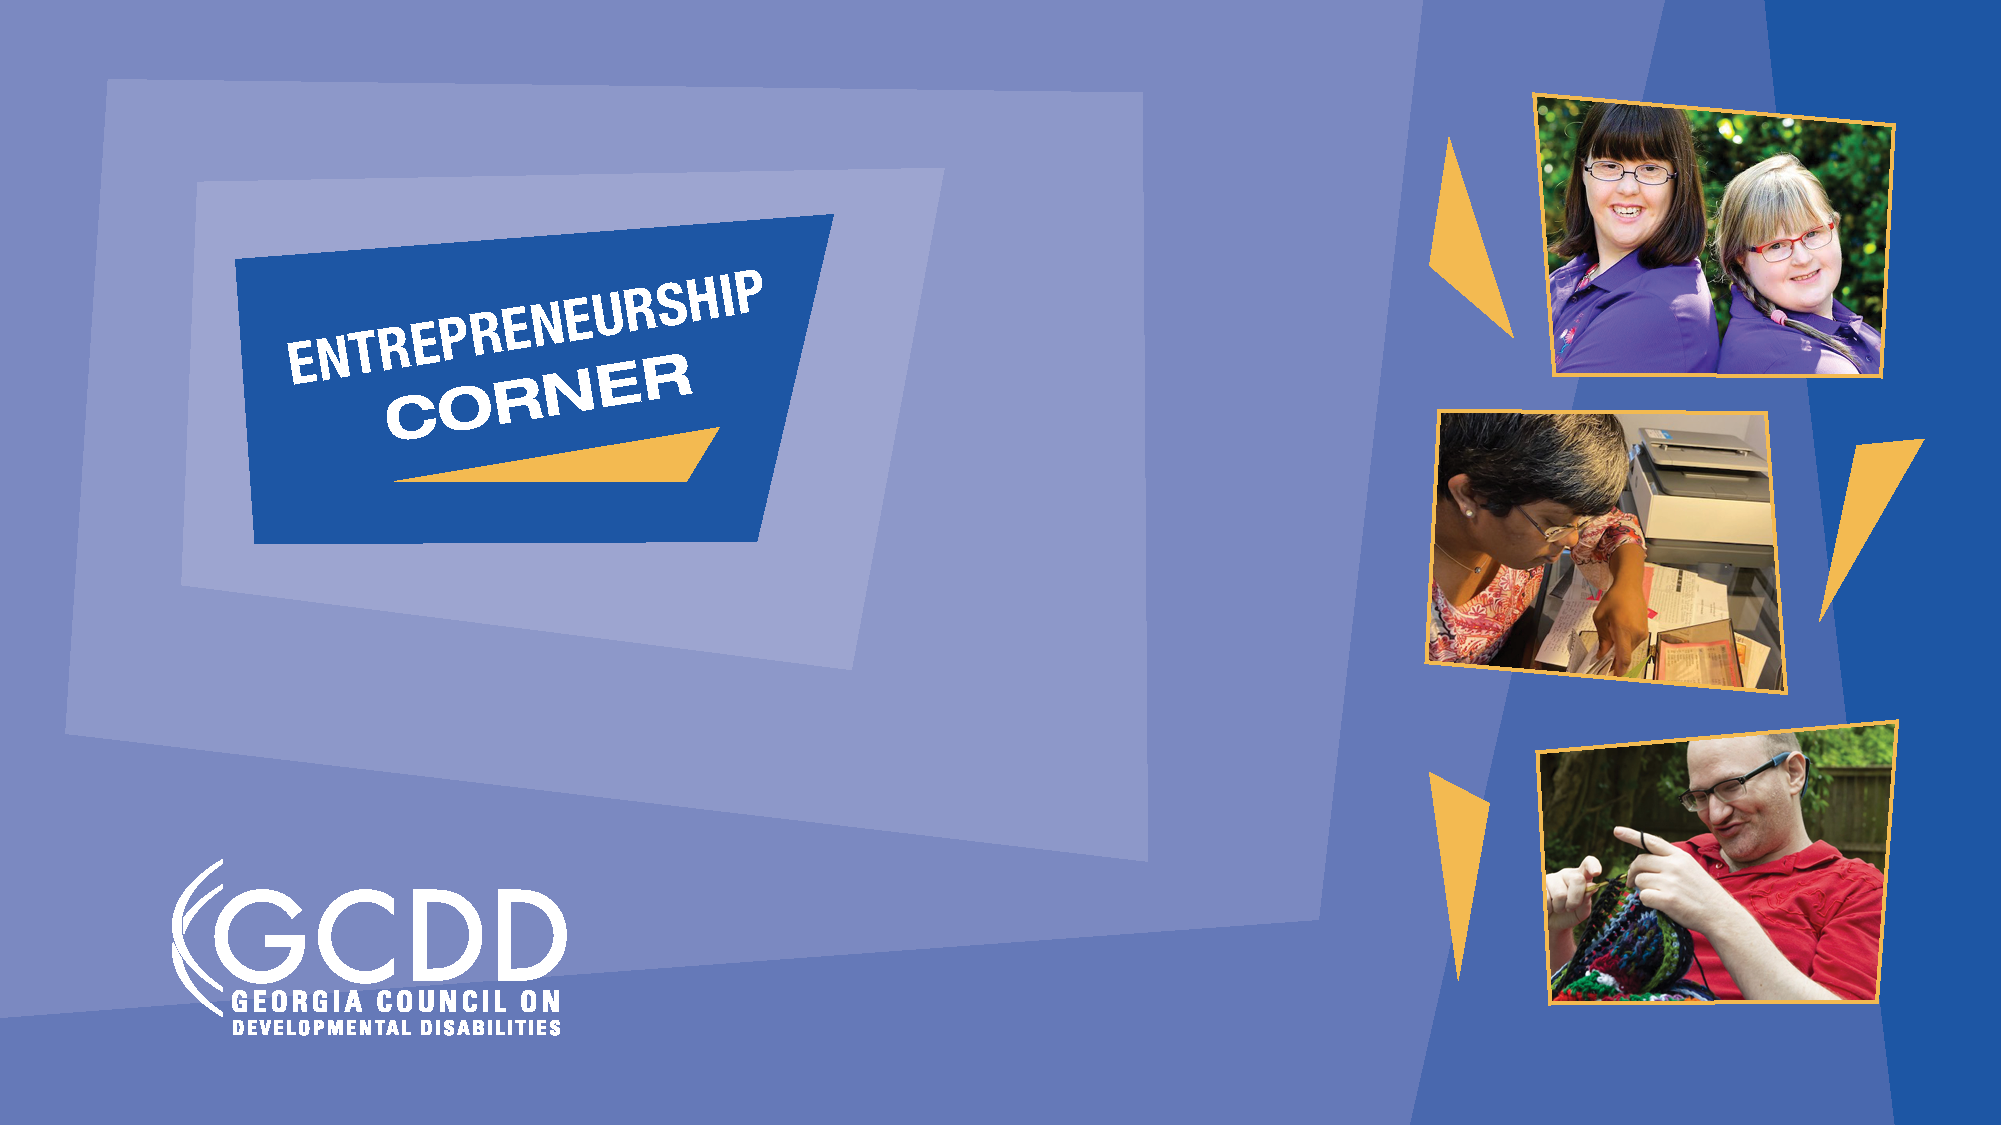 GCDD Entrepreneurship Corner.